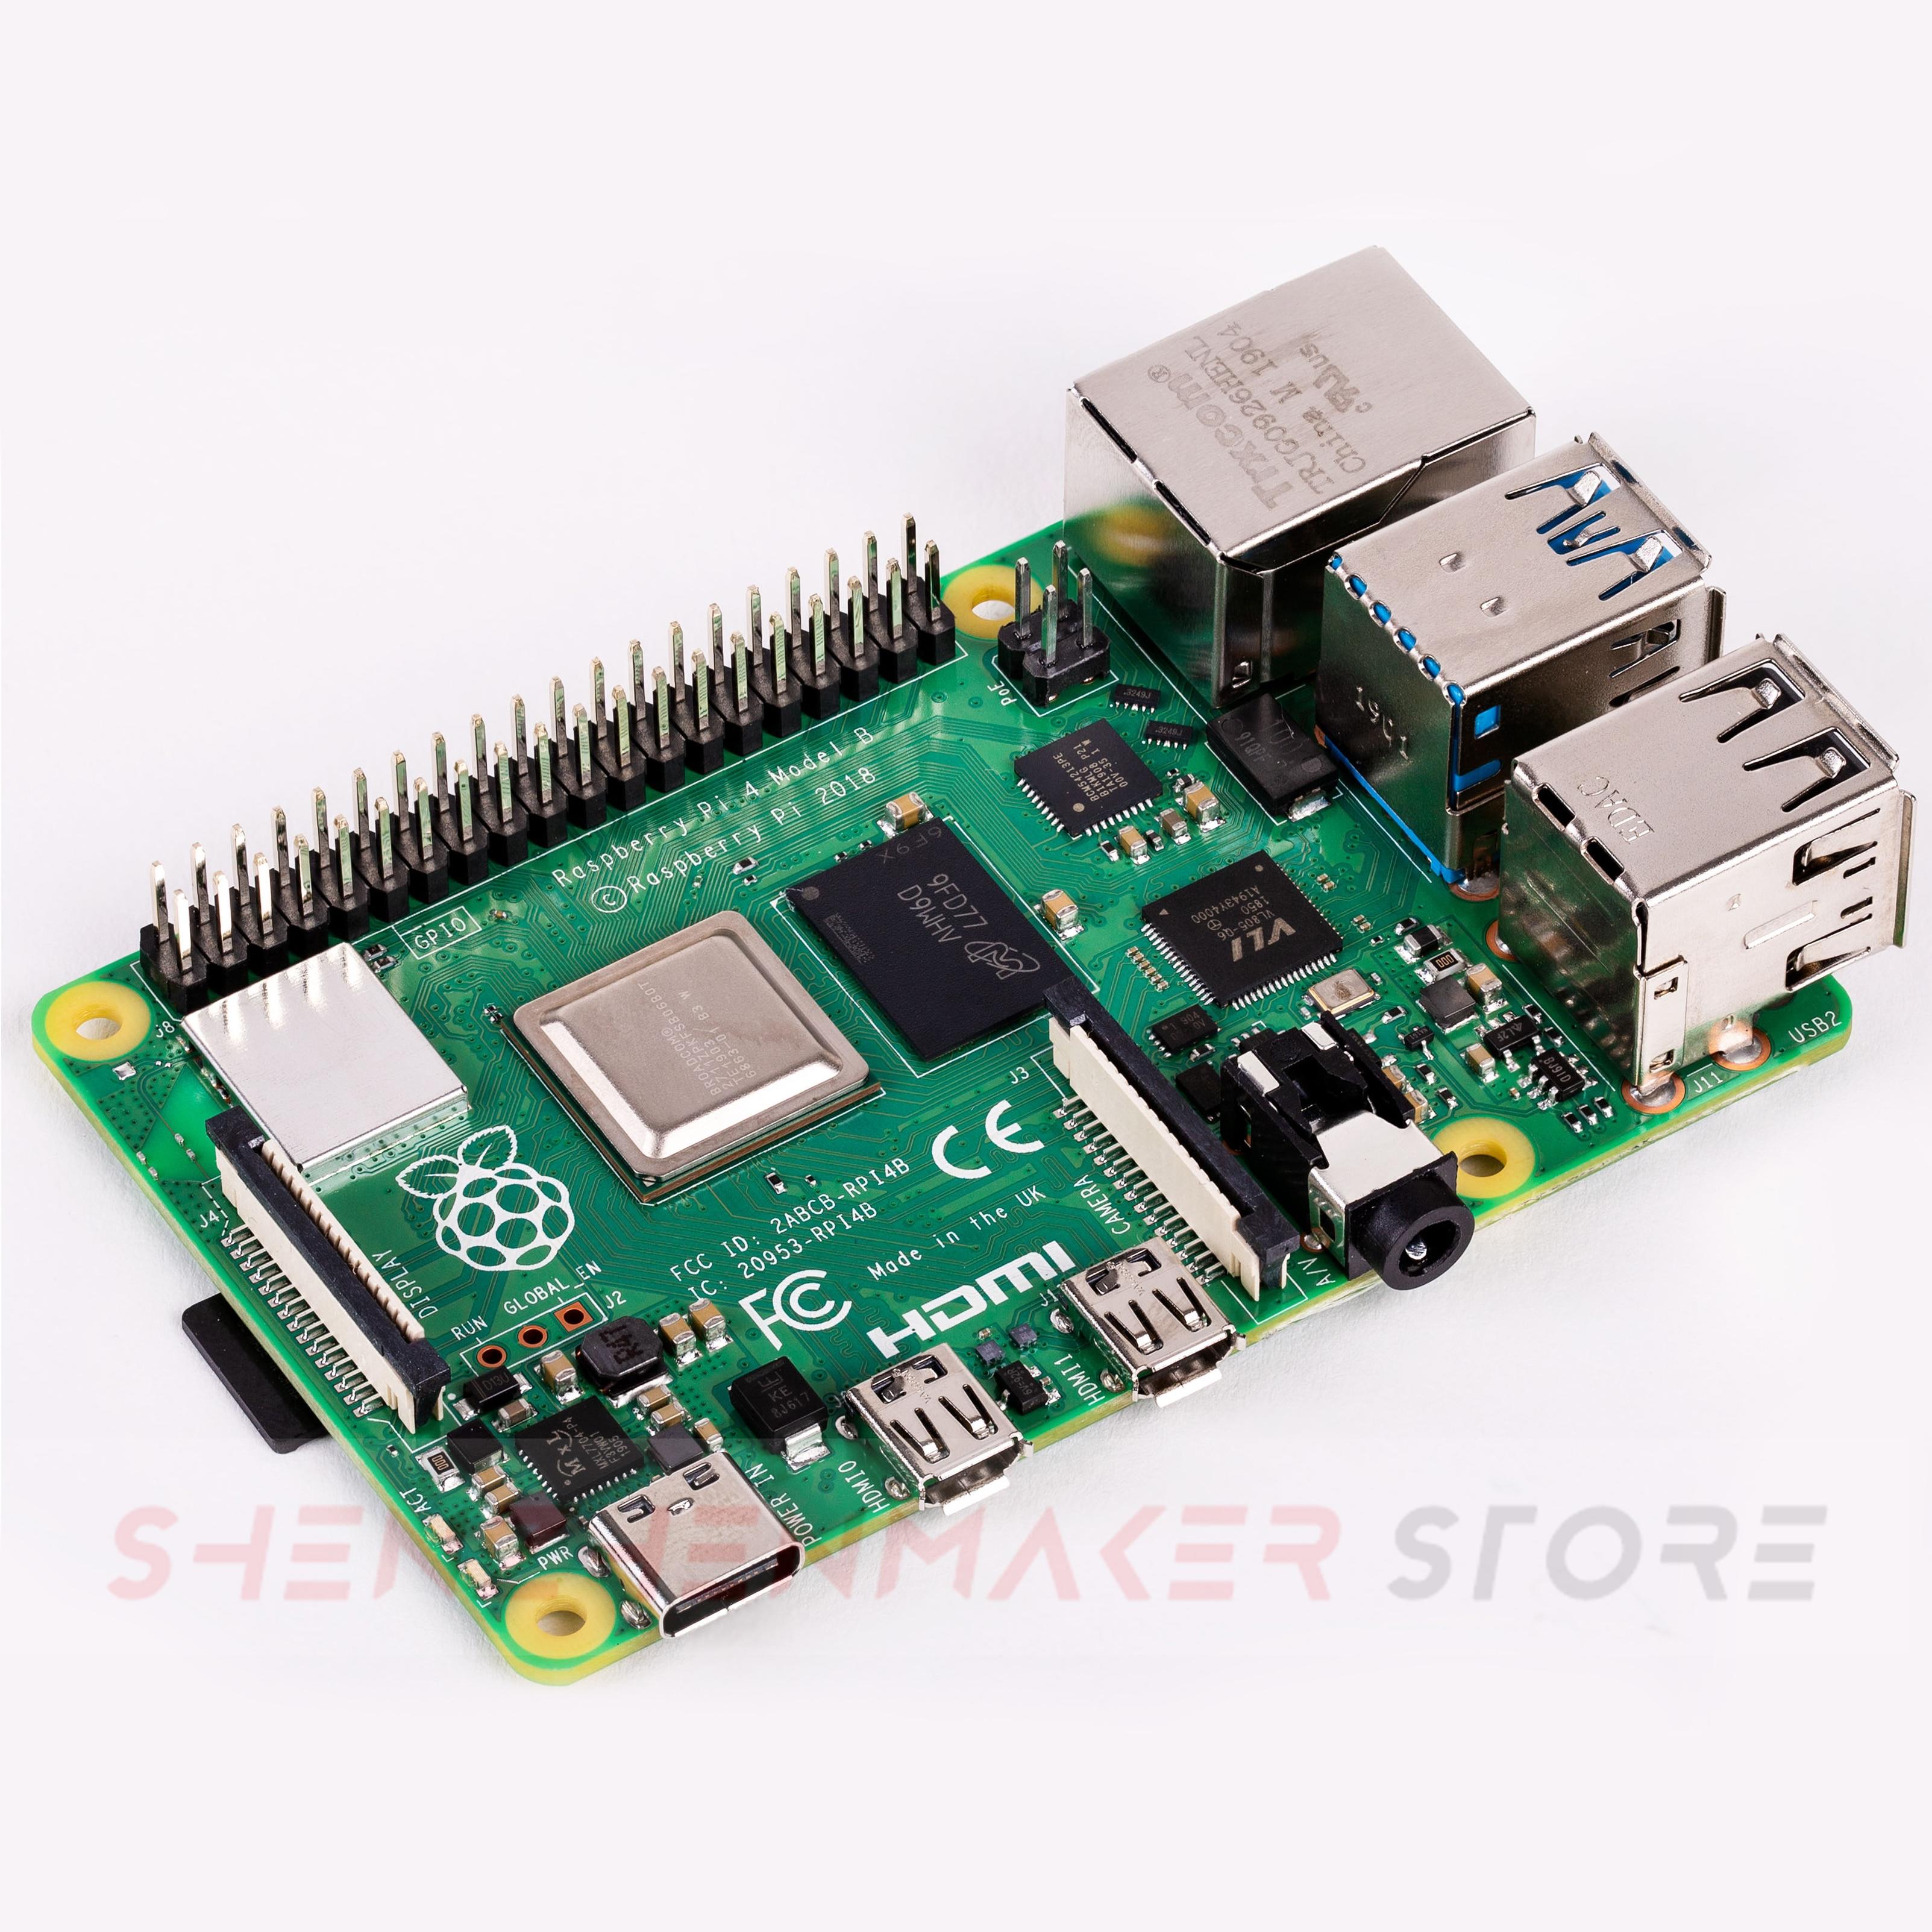 ShenzhenMaker Store Brand New Raspberry Pi 4 Model B 1GB 2GB 4GB RAM Type C Port Computer - IN STOCK